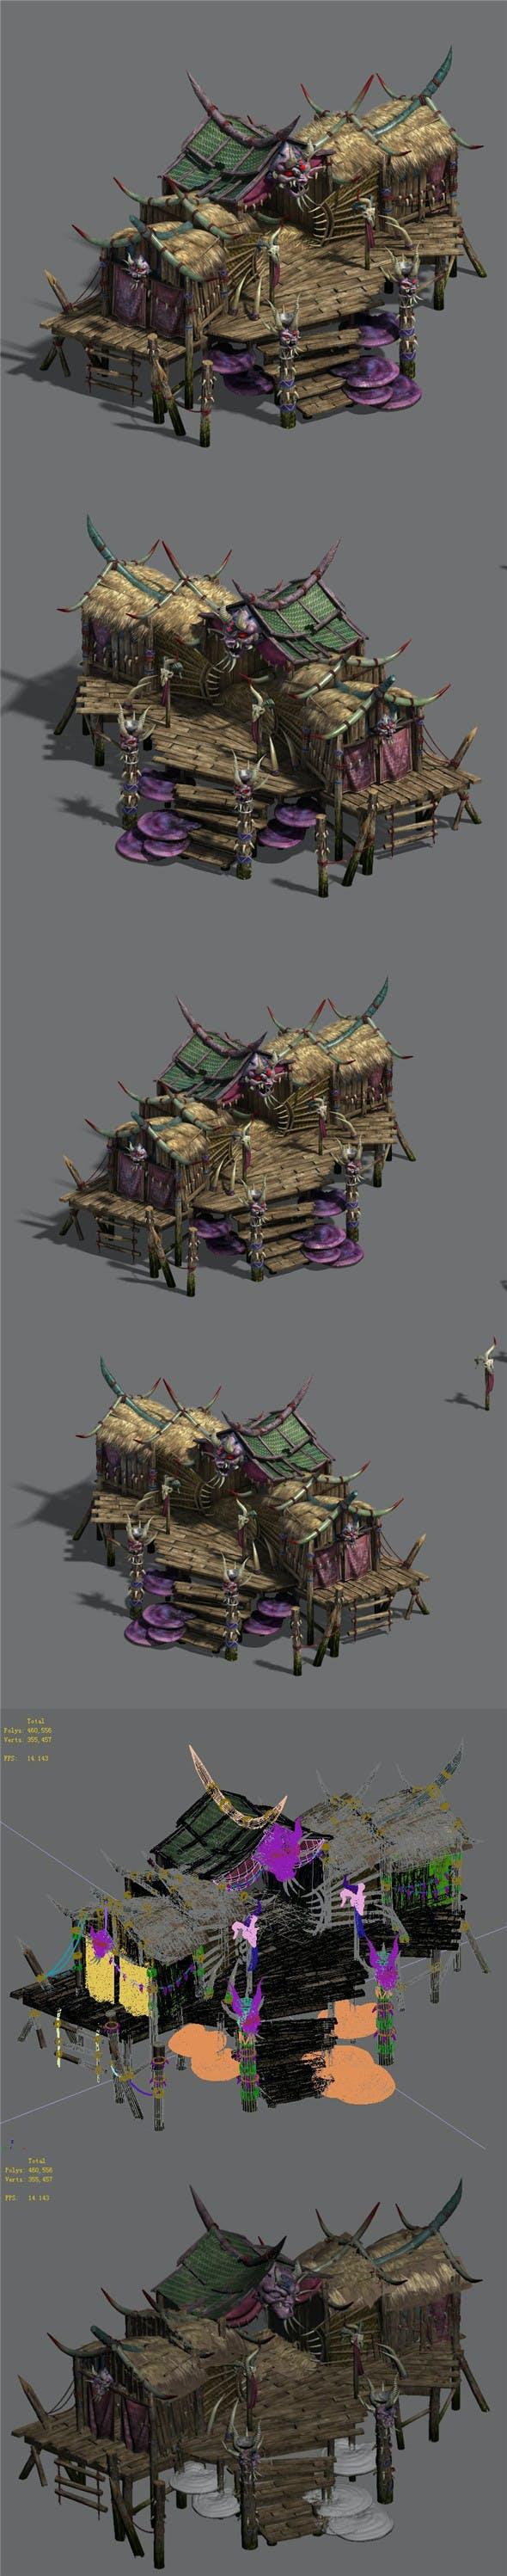 Water cloud Ze - witchcraft building 1 - 3DOcean Item for Sale